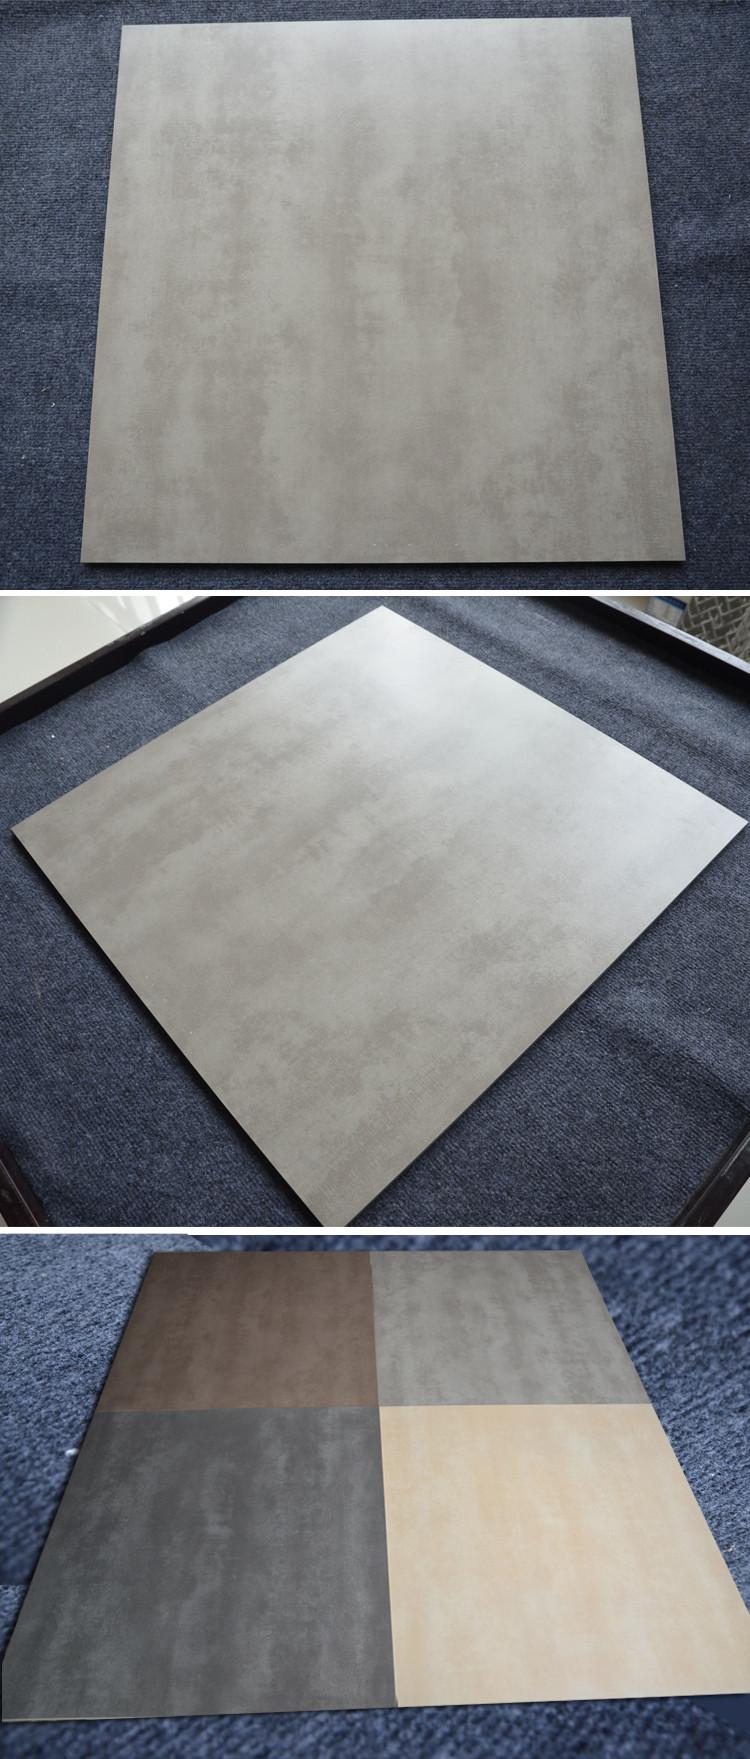 Hz6202m garage floor ceramic tile cementcement tiles manufacturing hz6202m garage floor ceramic tile cementcement tiles manufacturing dailygadgetfo Gallery